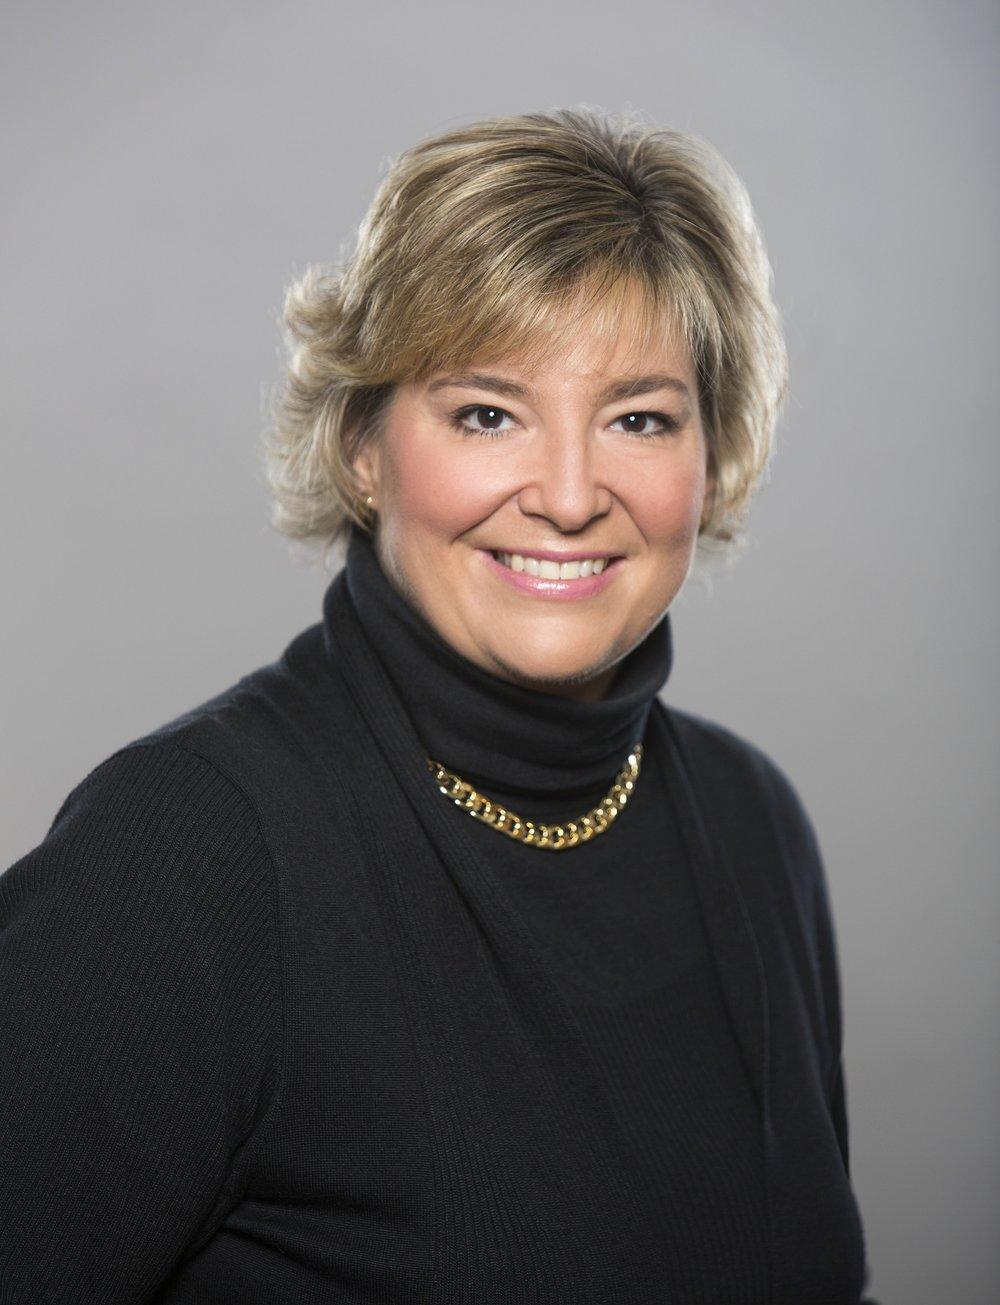 Kate Kuttruff, Senior Vice President of Operations